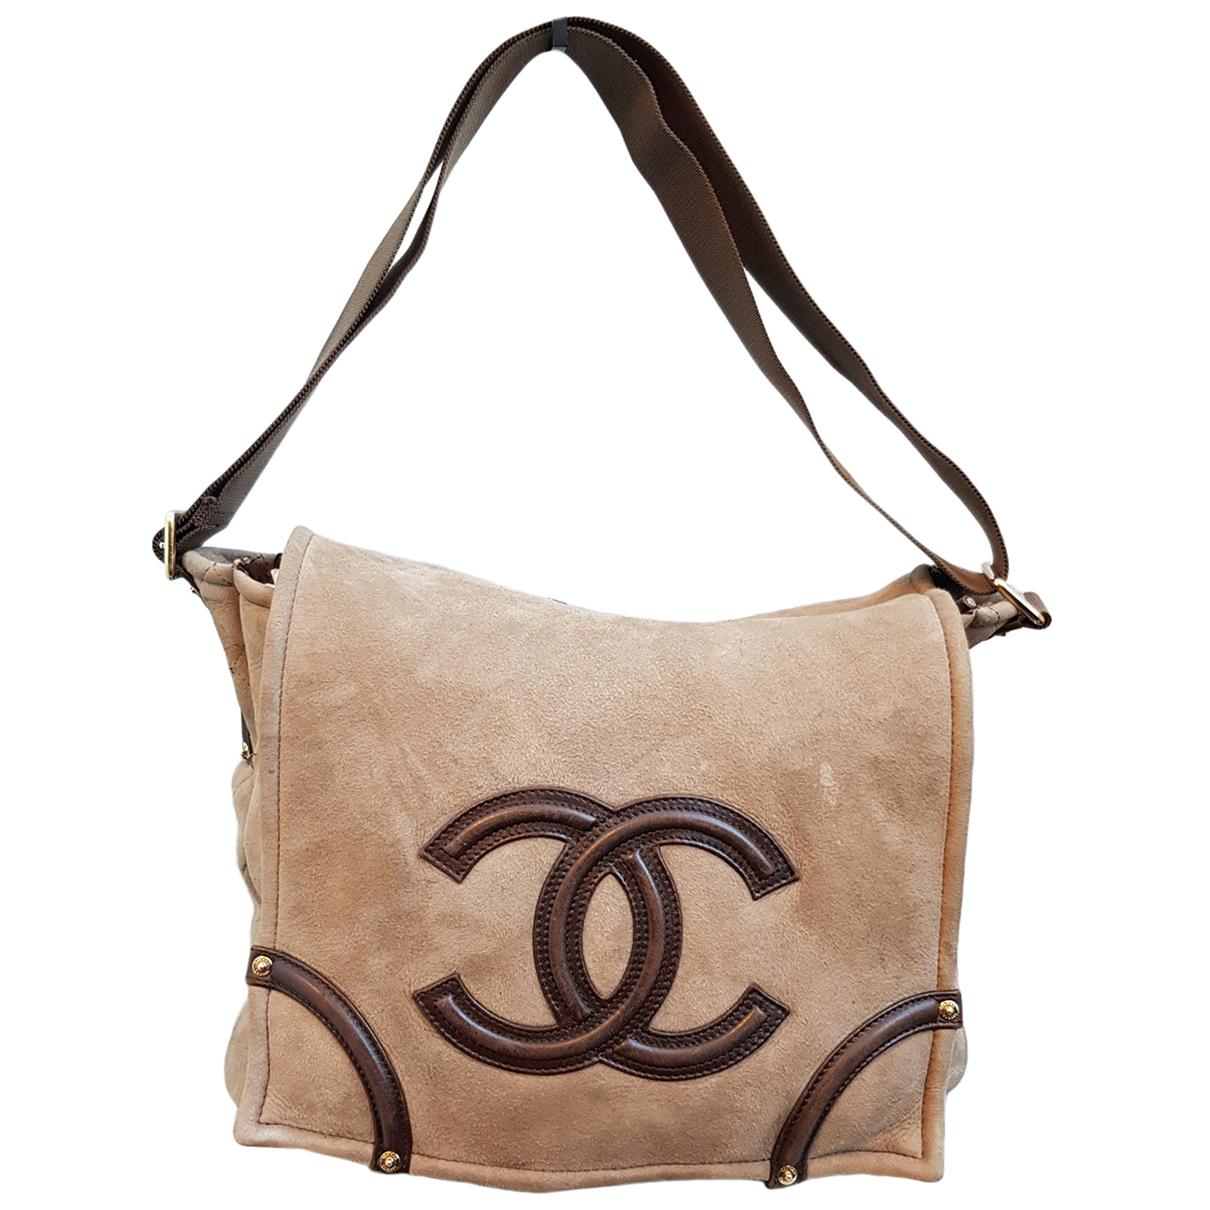 Chanel \N Beige Suede handbag for Women \N